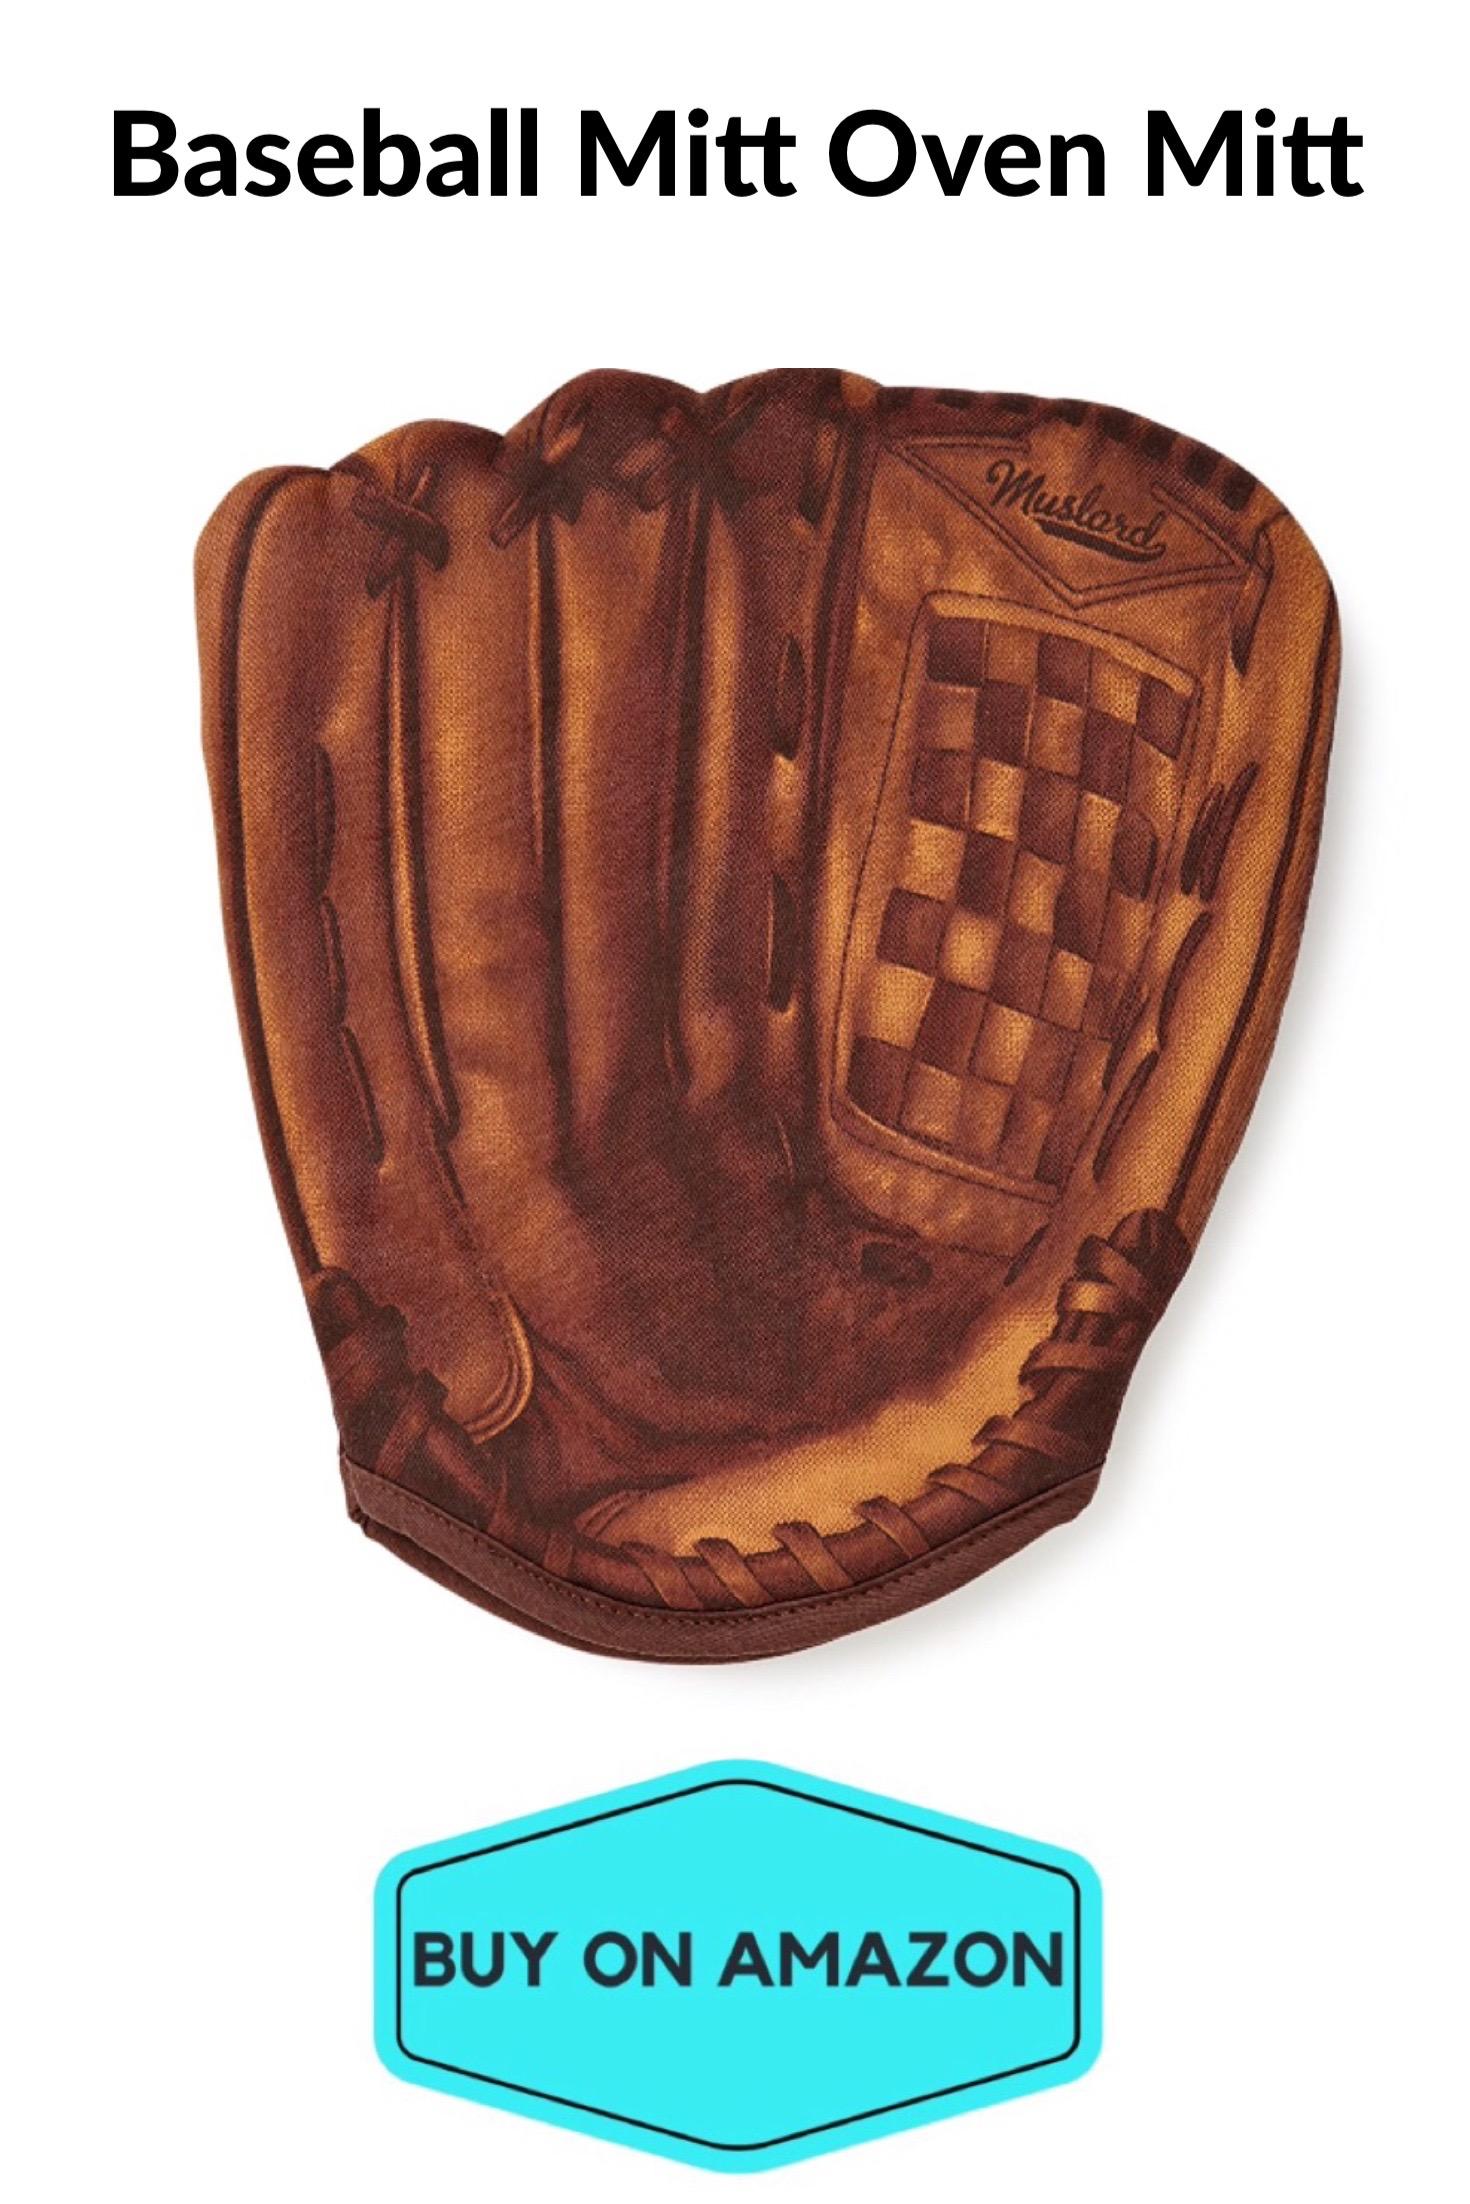 Baseball Mitt Oven Mitt